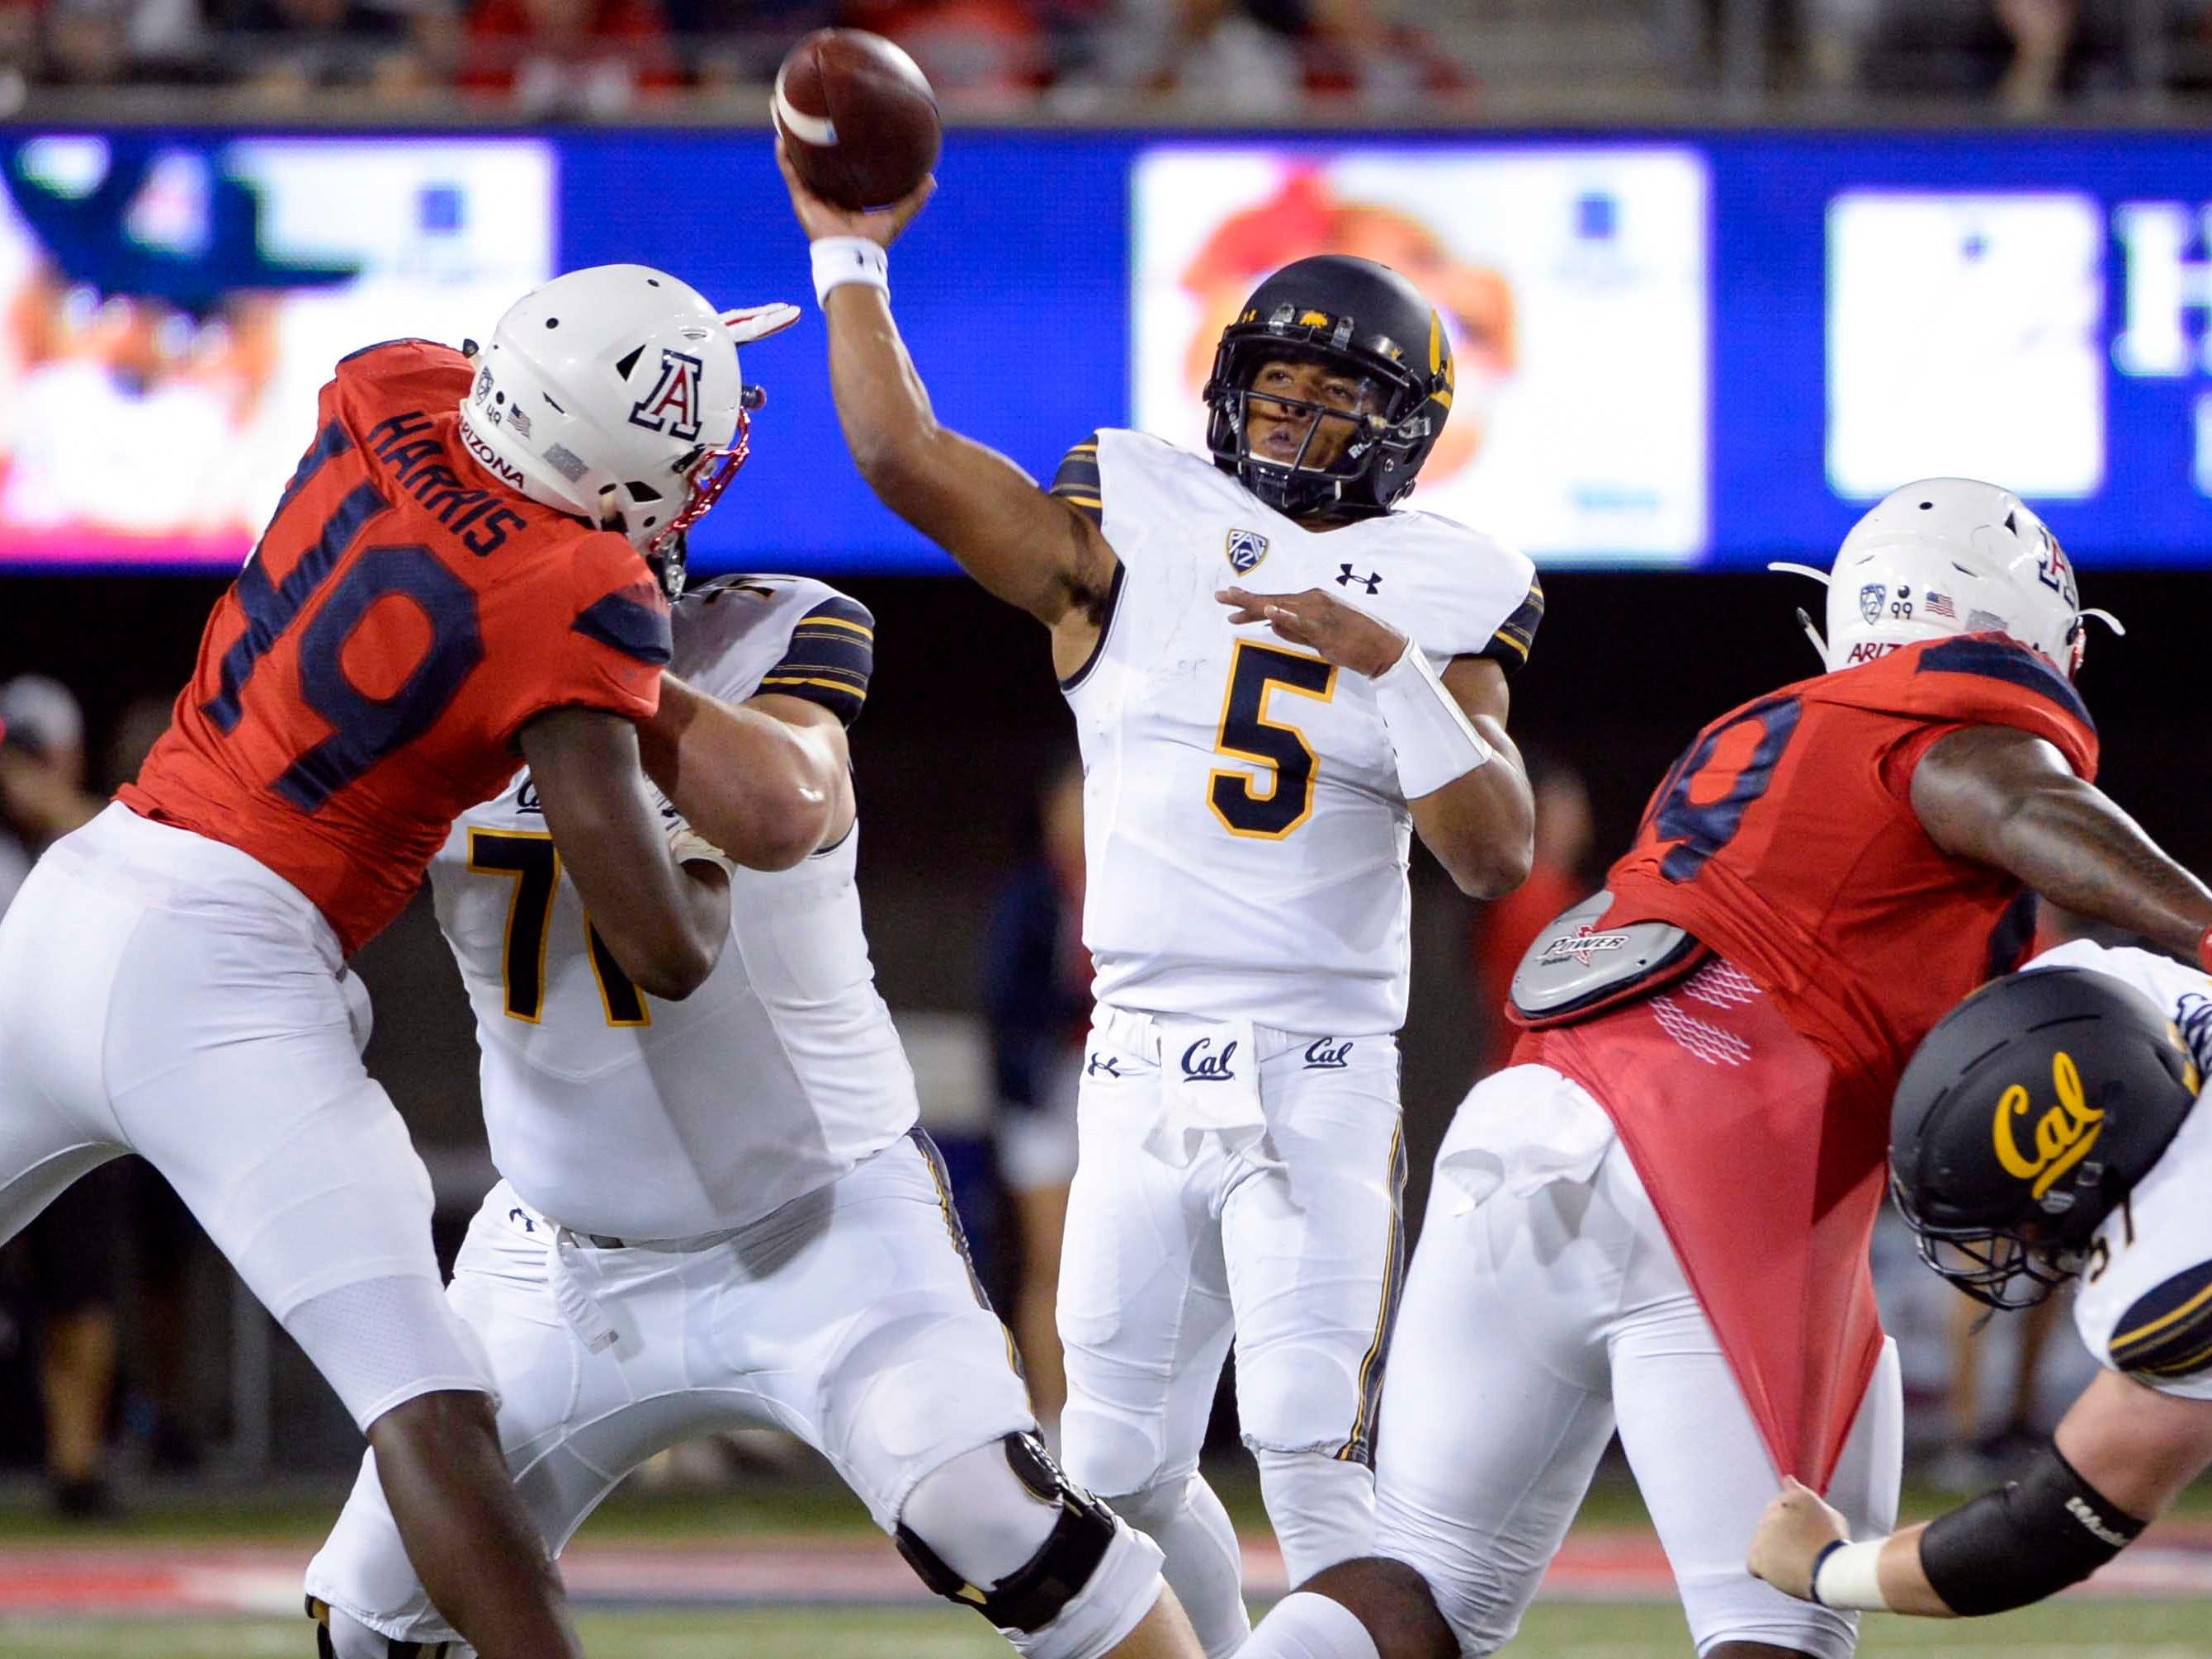 Oct 6, 2018; Tucson, AZ, USA; California Golden Bears quarterback Brandon McIlwain (5) passes the ball as Arizona Wildcats defensive end Jalen Harris (49) defends during the first half at Arizona Stadium. Mandatory Credit: Casey Sapio-USA TODAY Sports